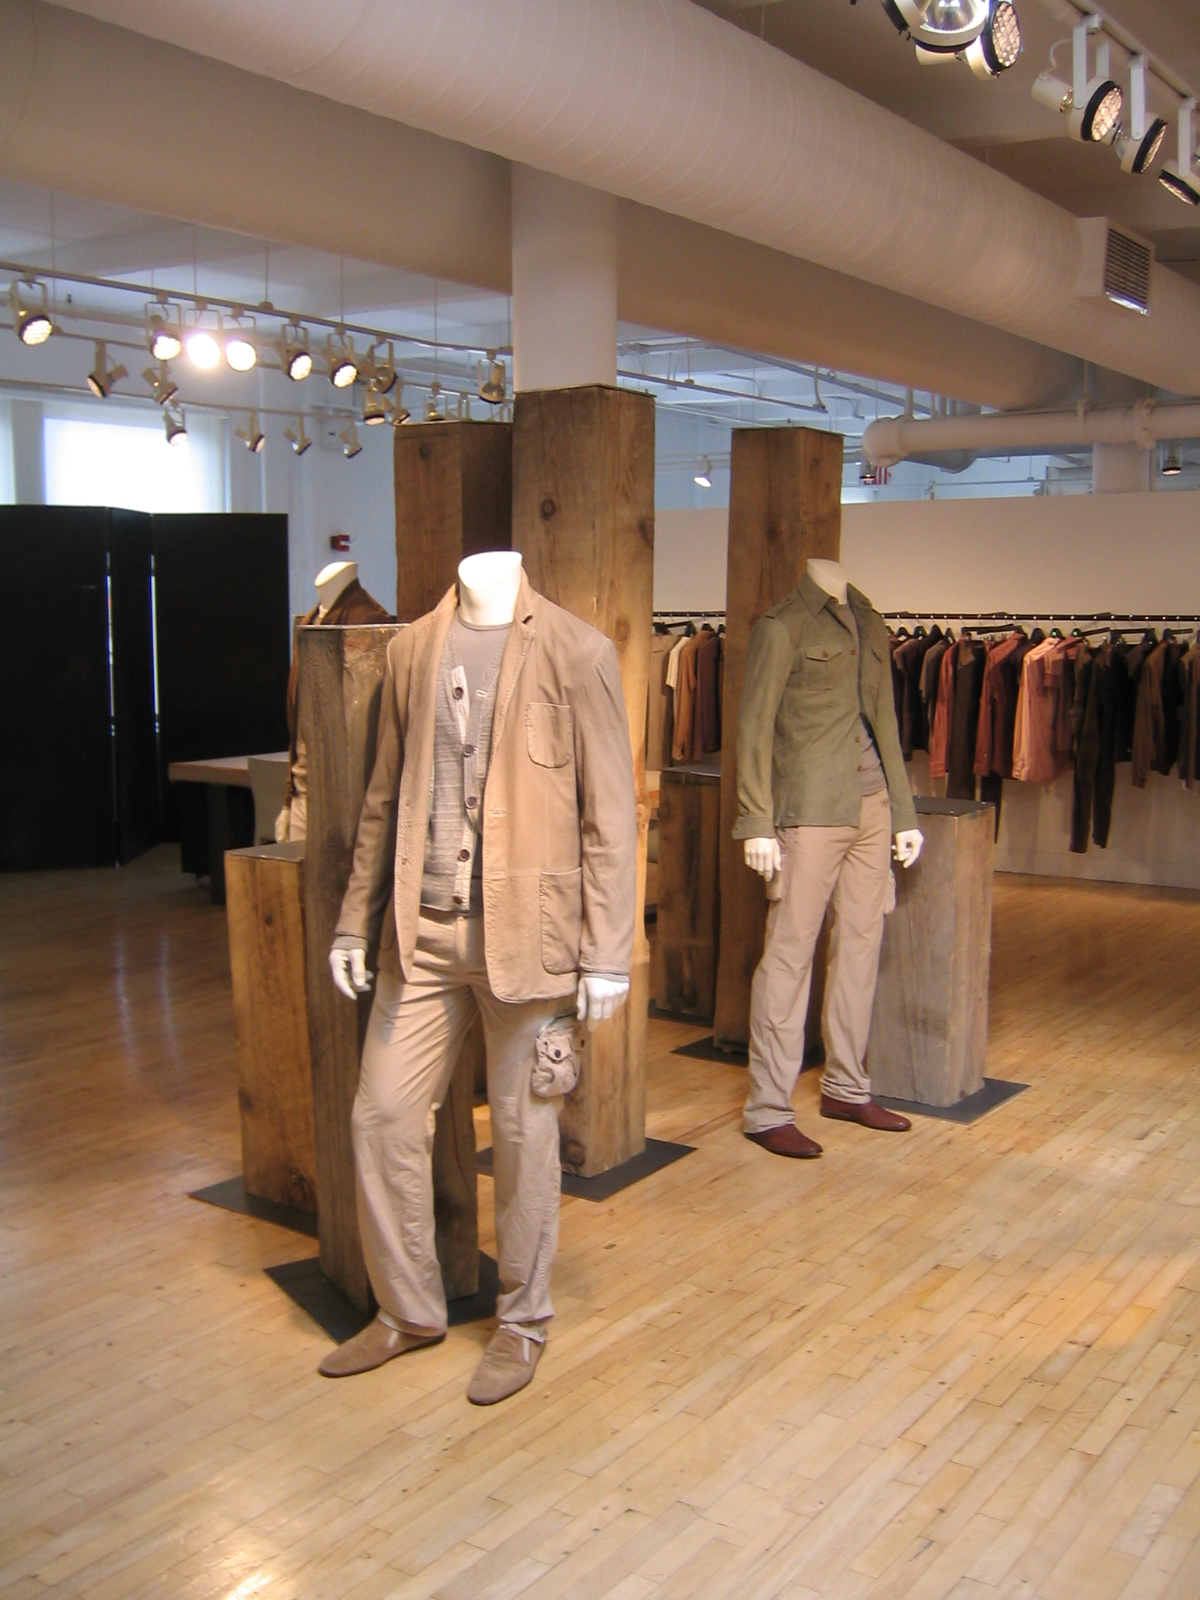 stores_28.JPG